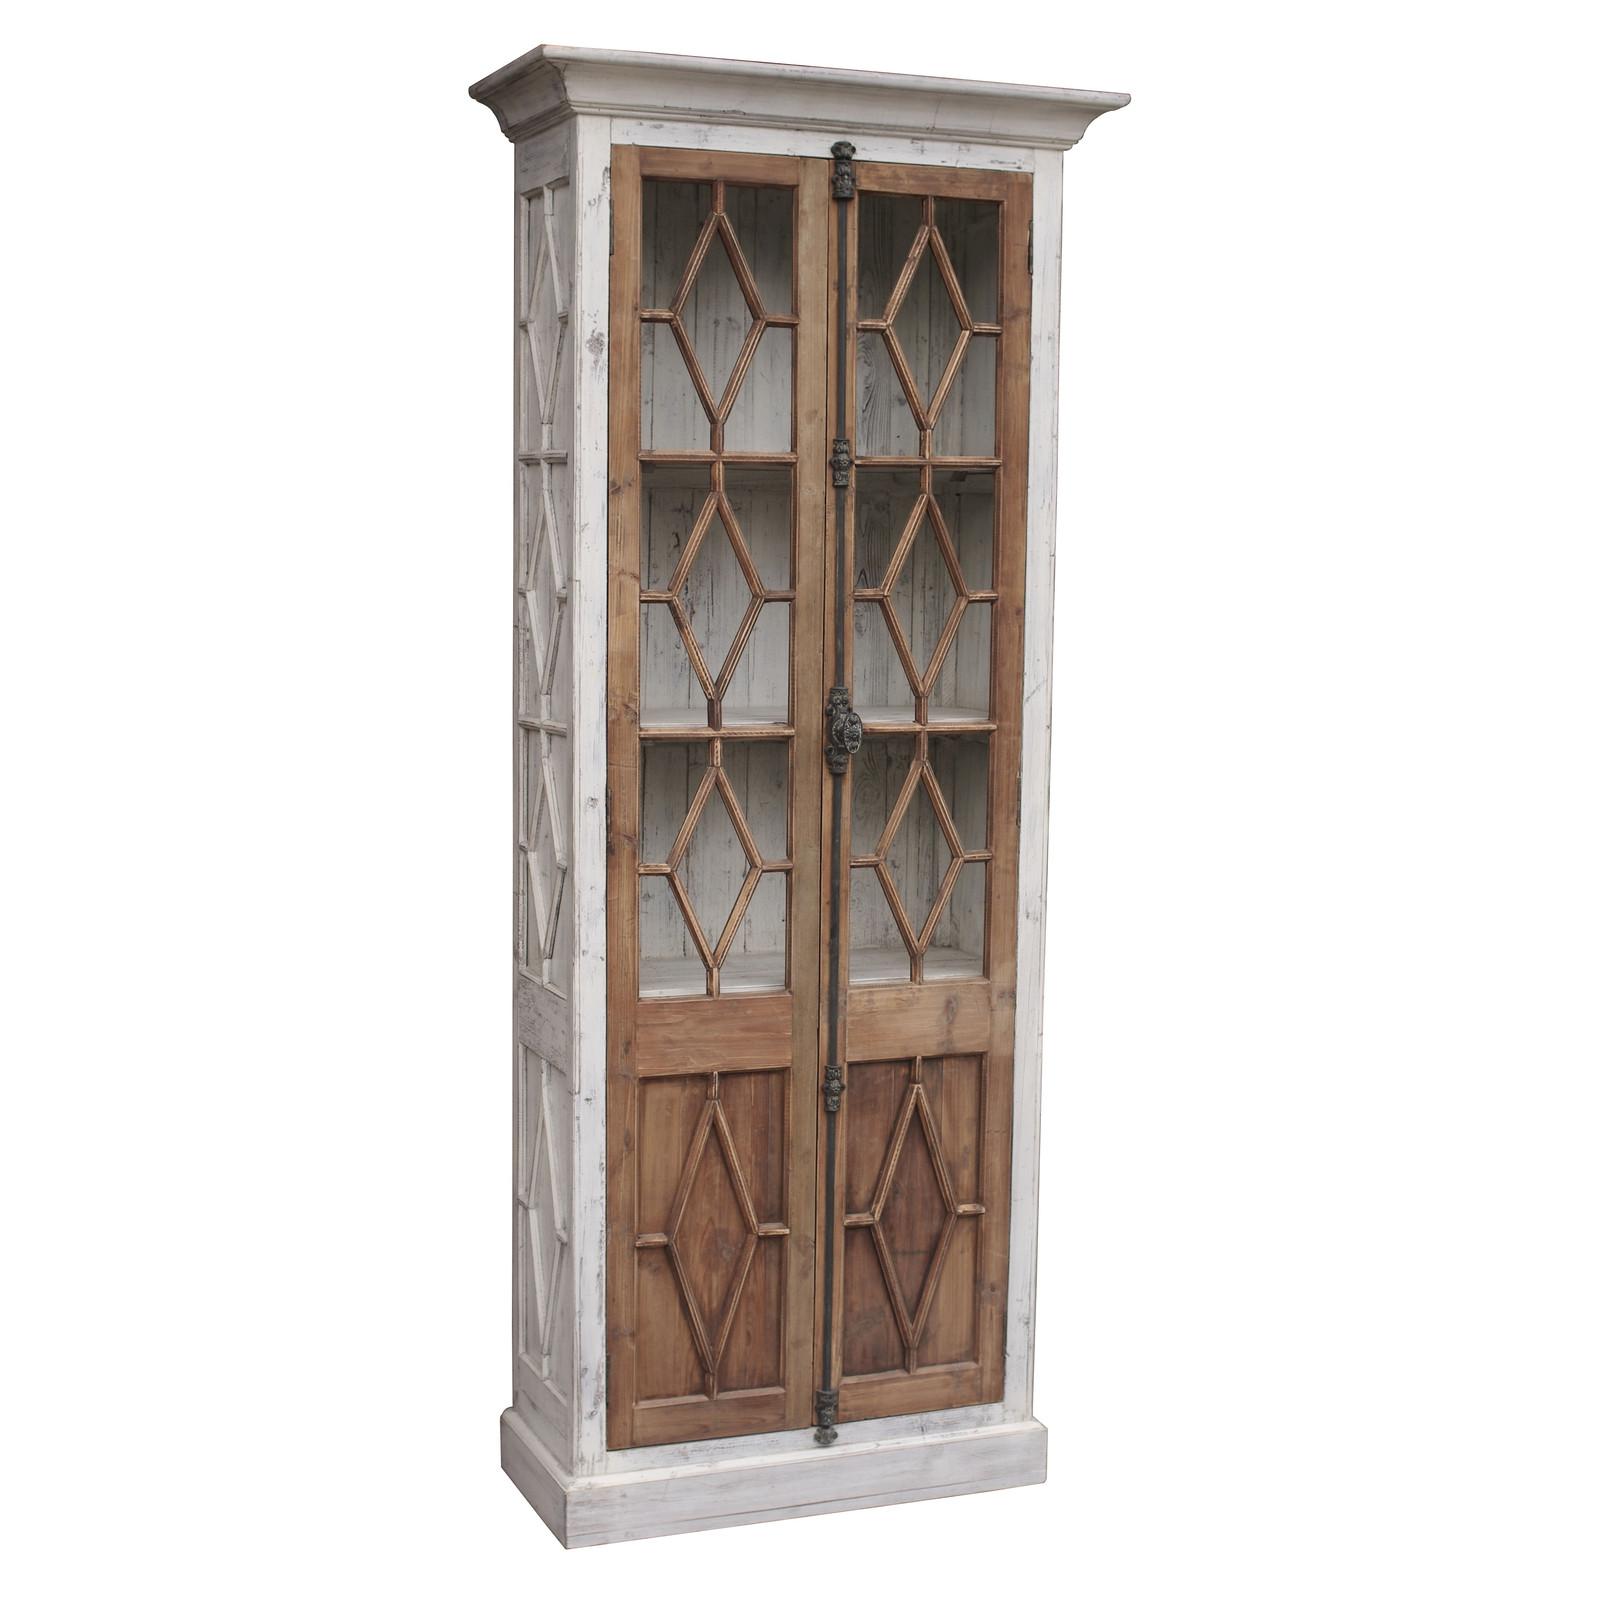 Dove White Kitchen Cabinets Restoration Hardware Horchow French Casement Glass